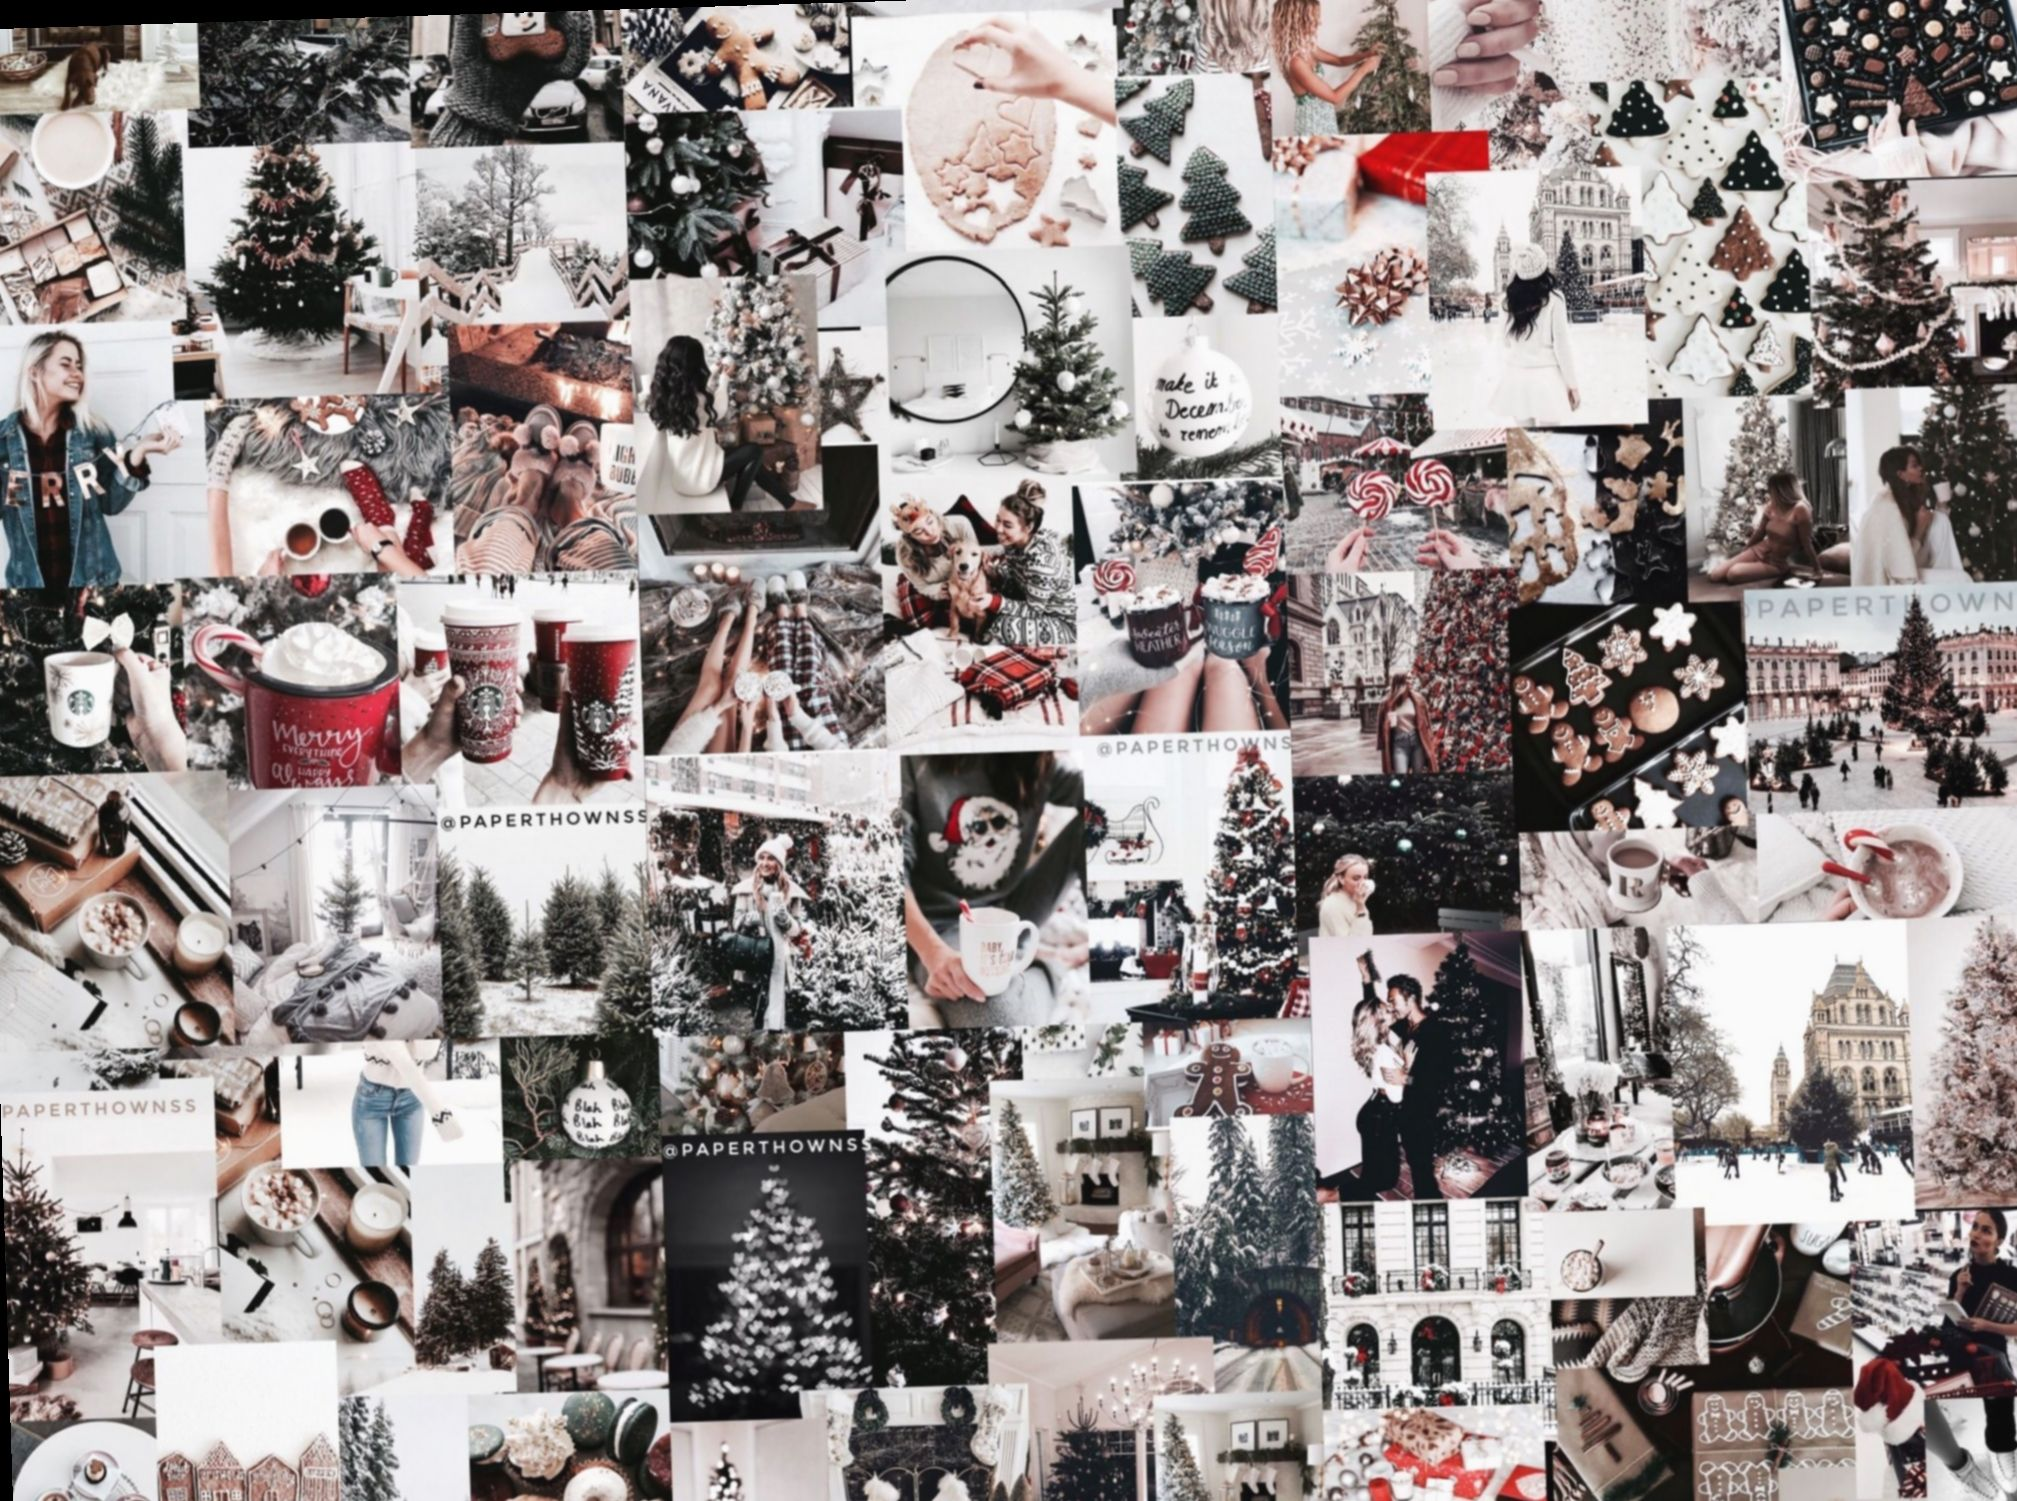 Wallpaper Ipad Winter Xmas Animal Dark Iphone In 2020 Christmas Collage Xmas Wallpaper Ipad Wallpaper